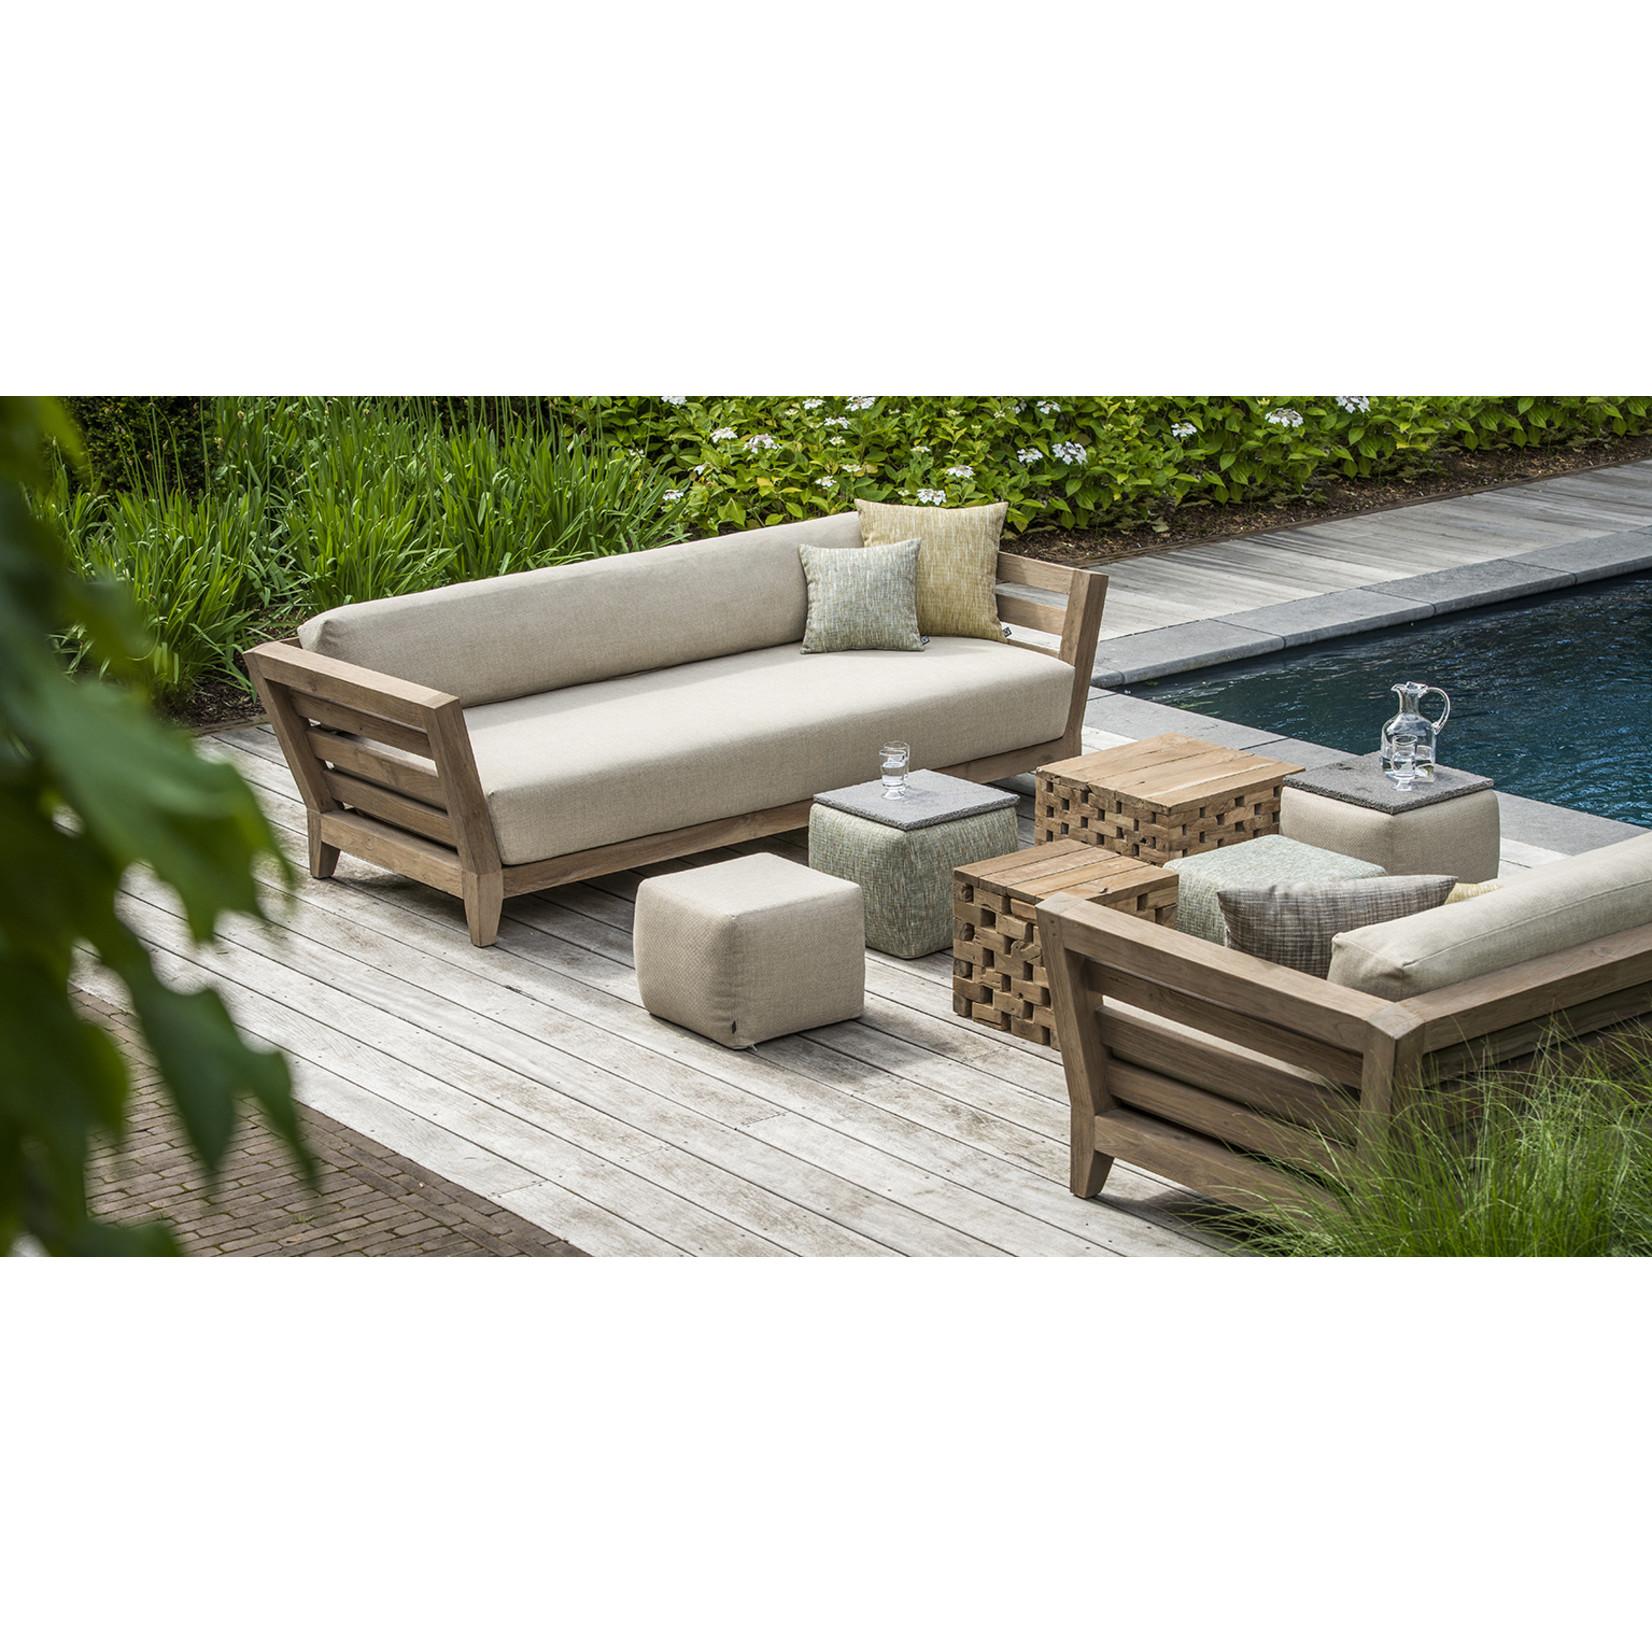 Gommaire Sofa Mia | Reclaimed Teak Natural Gray + Cushion